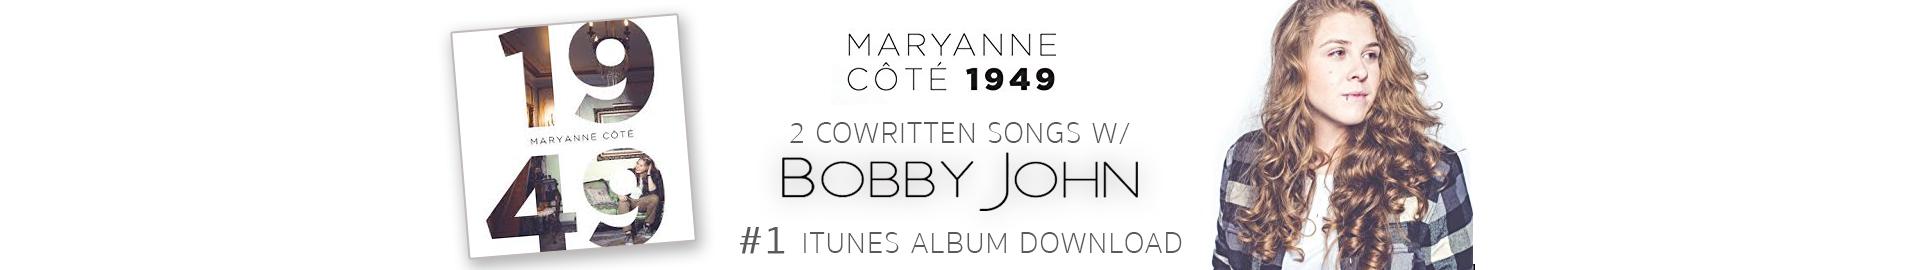 Maryanne Cote - Website TopImage 110817